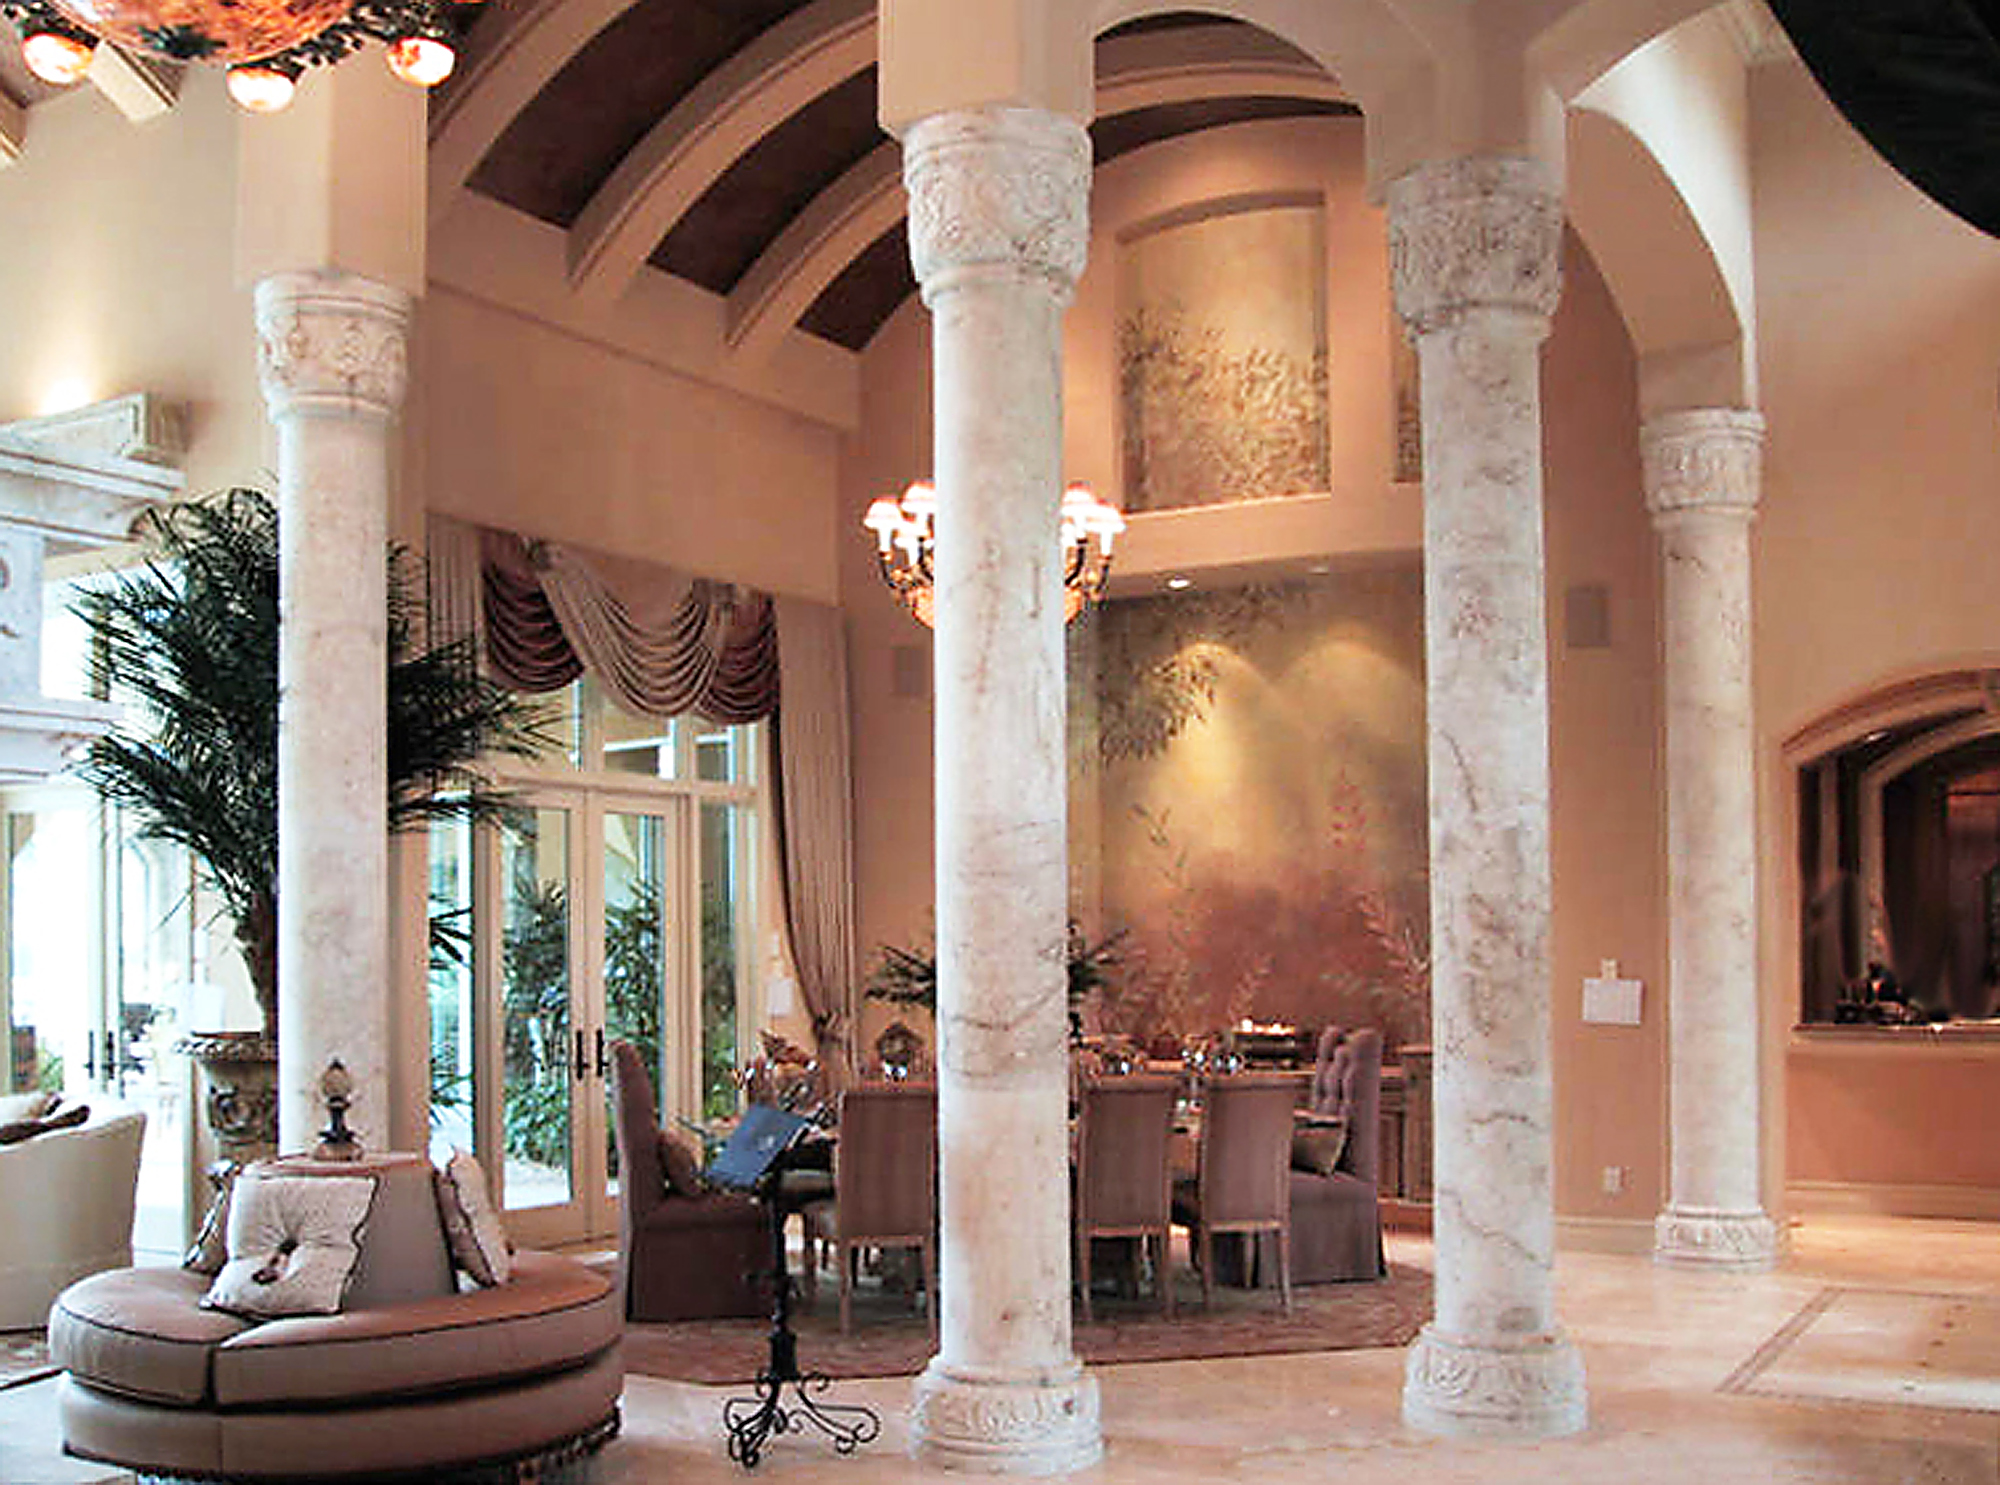 Enrique. Interior Columns_2000x1485px.jpg